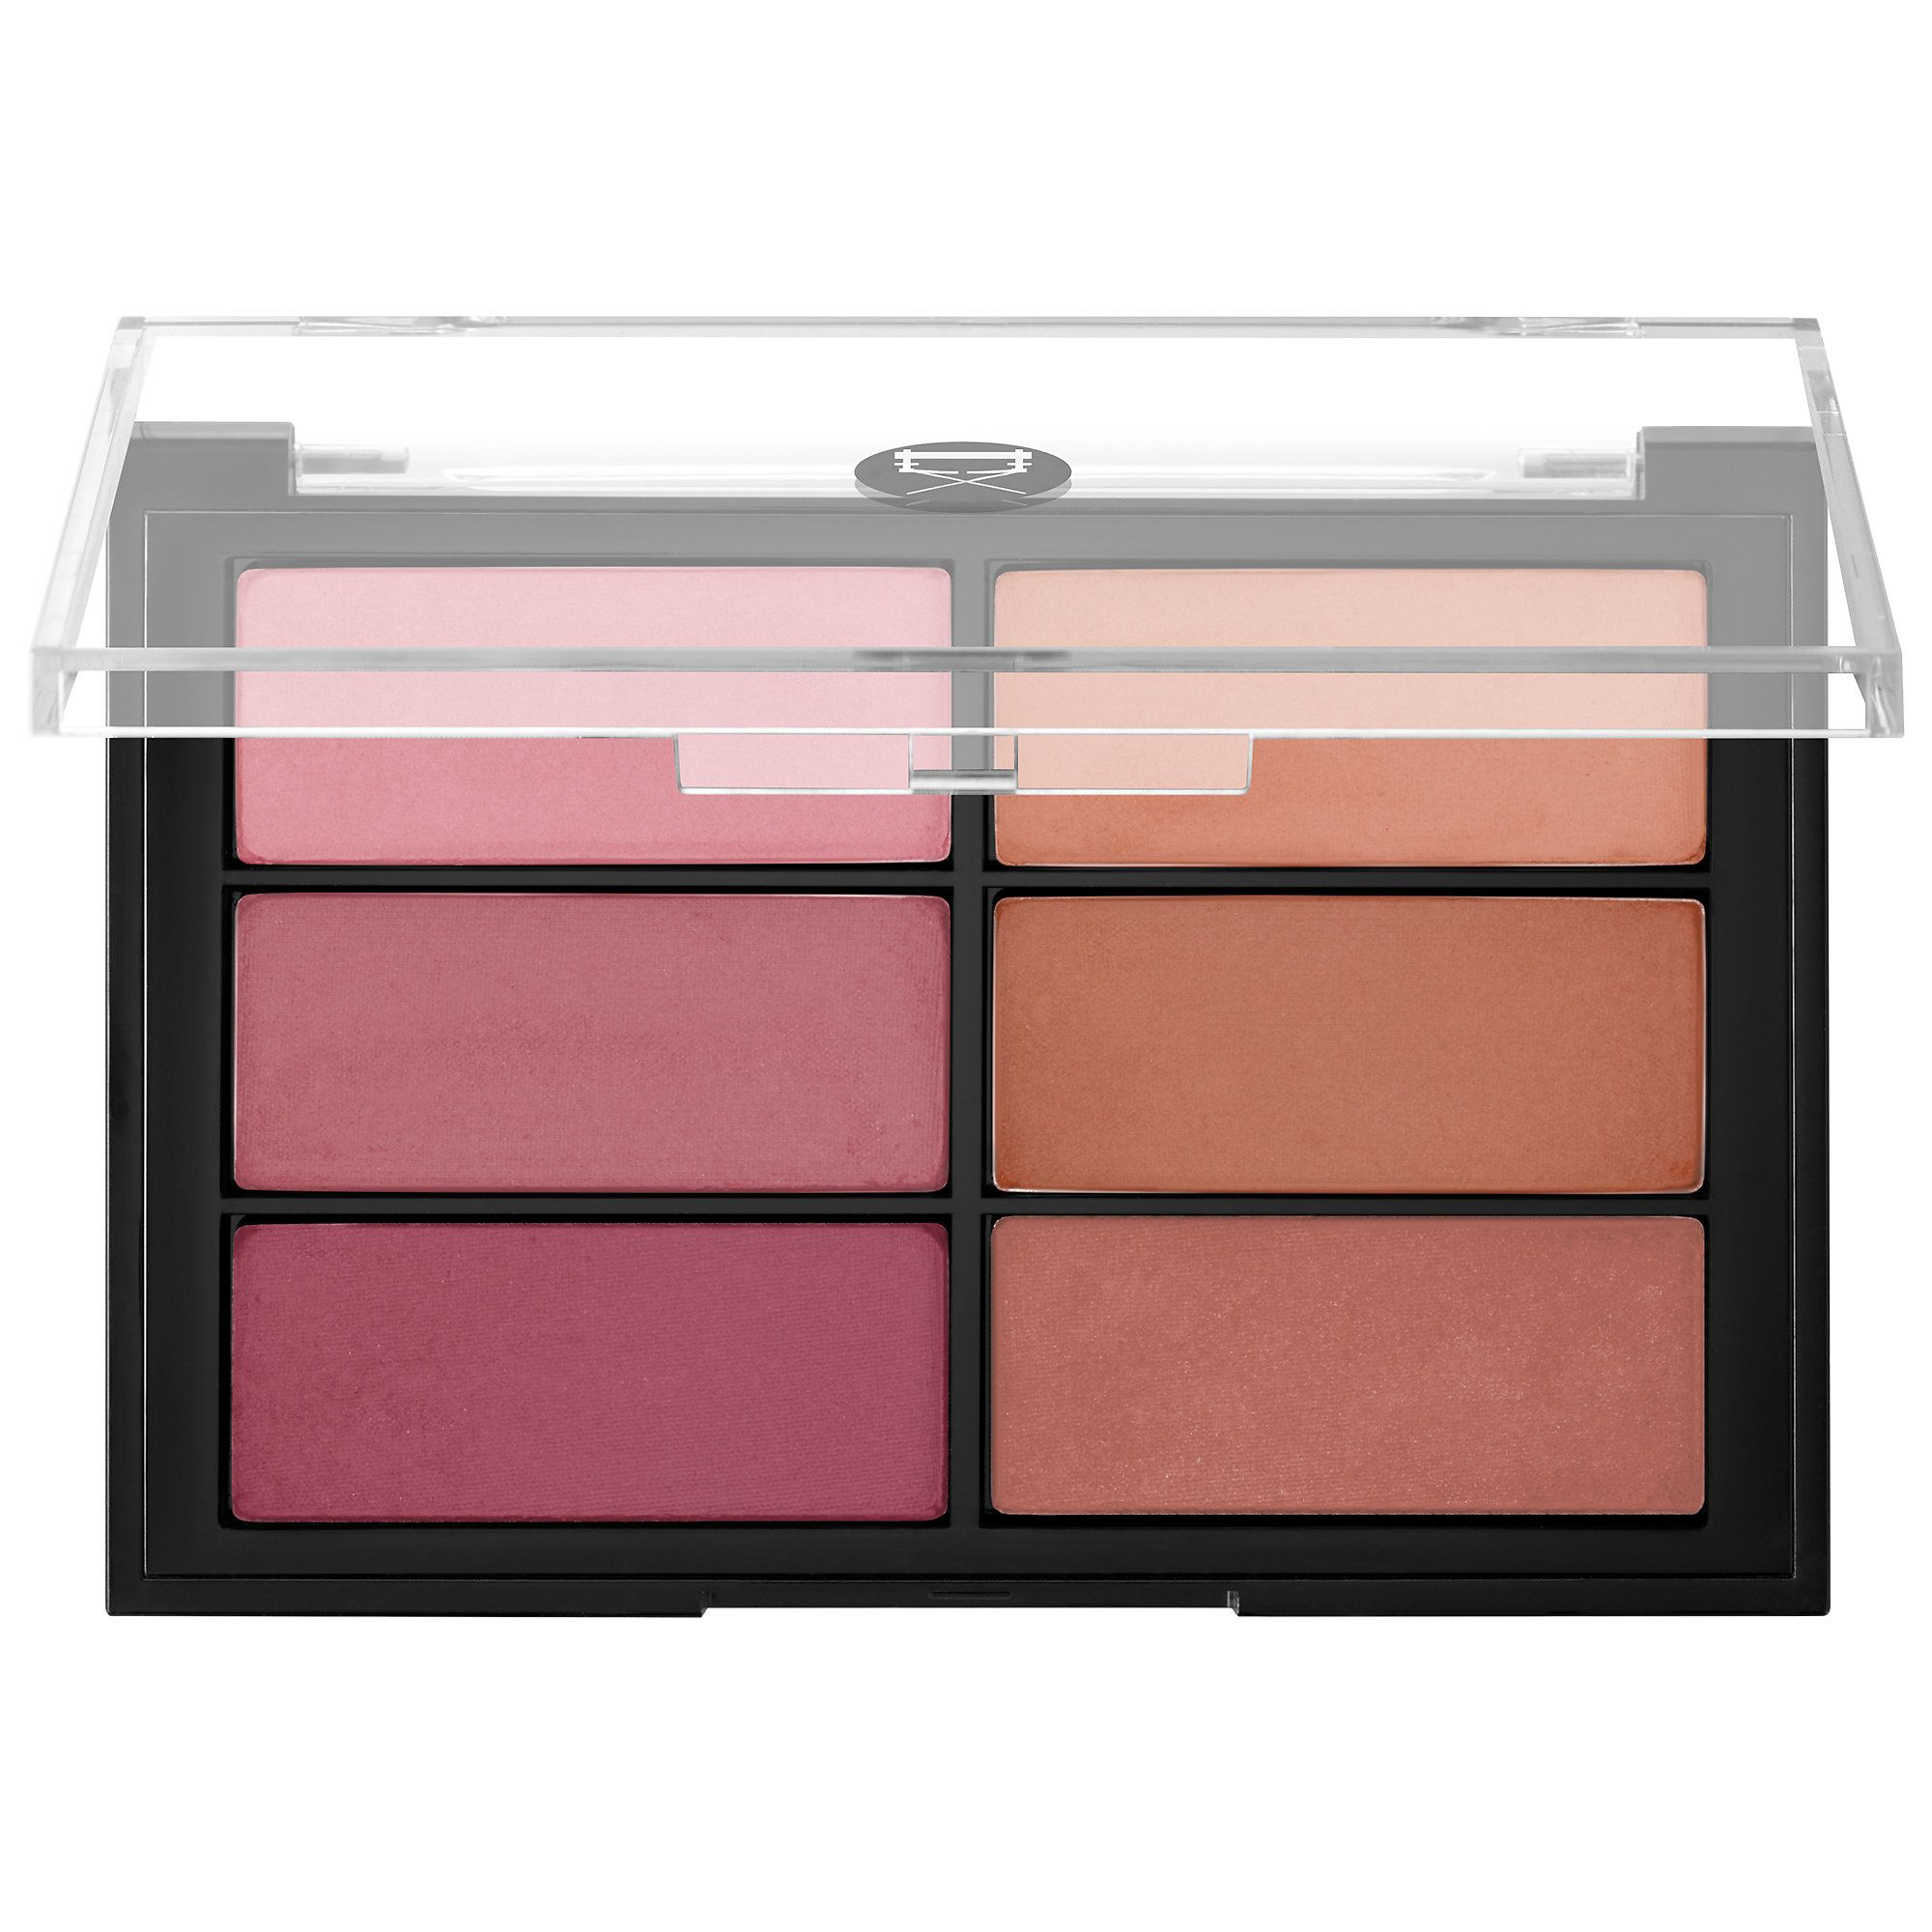 Blush Palette Viseart Sephora (With images) Blush